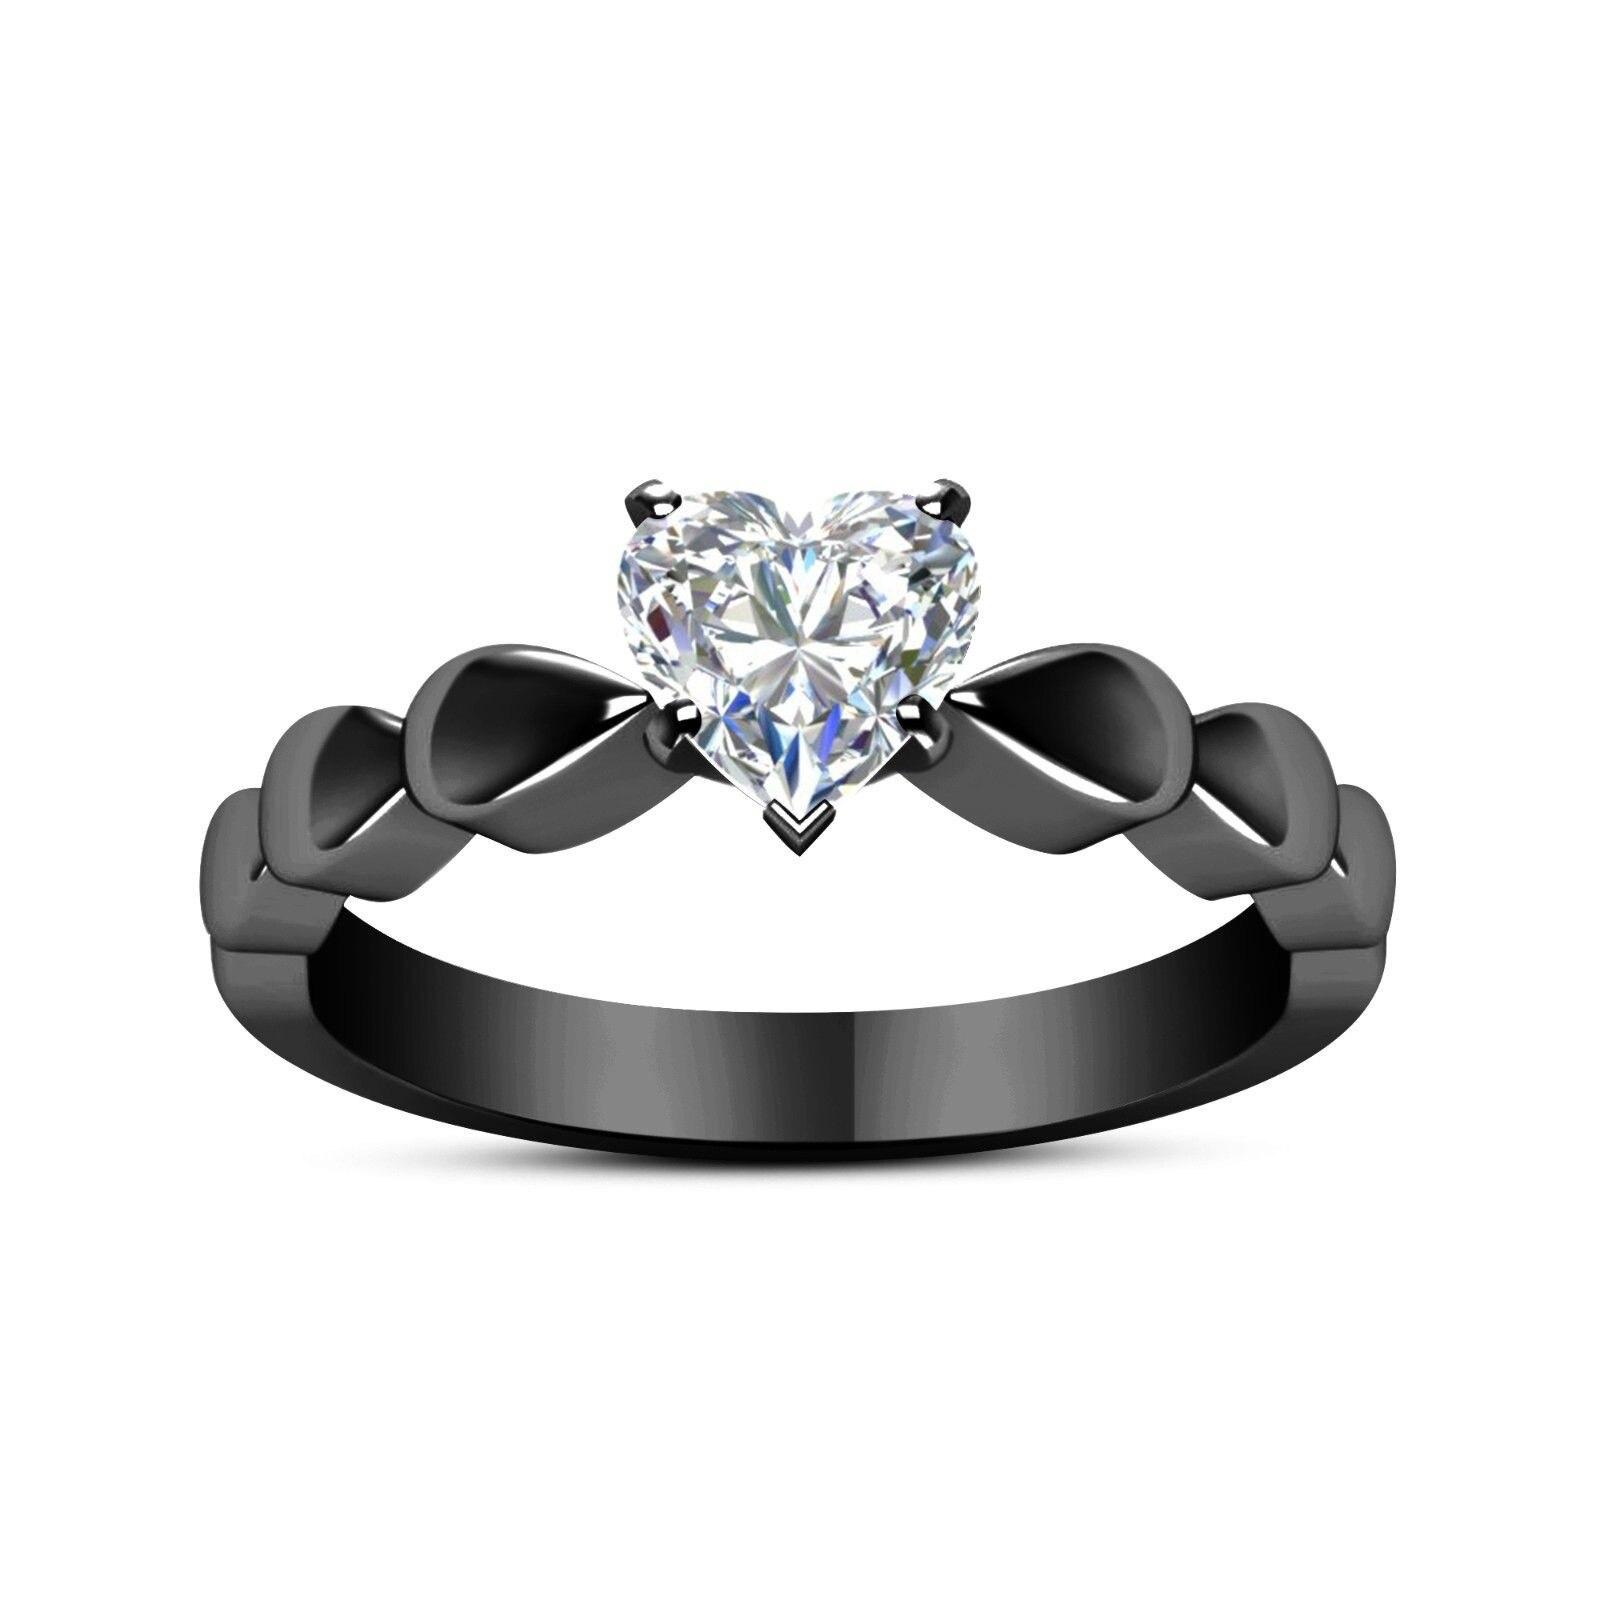 White Love Heart Zircon Black Ring Women 2018 Fashion Jewelry Couple Rings Finger Ring Ladies Party Rings Anel Feminino